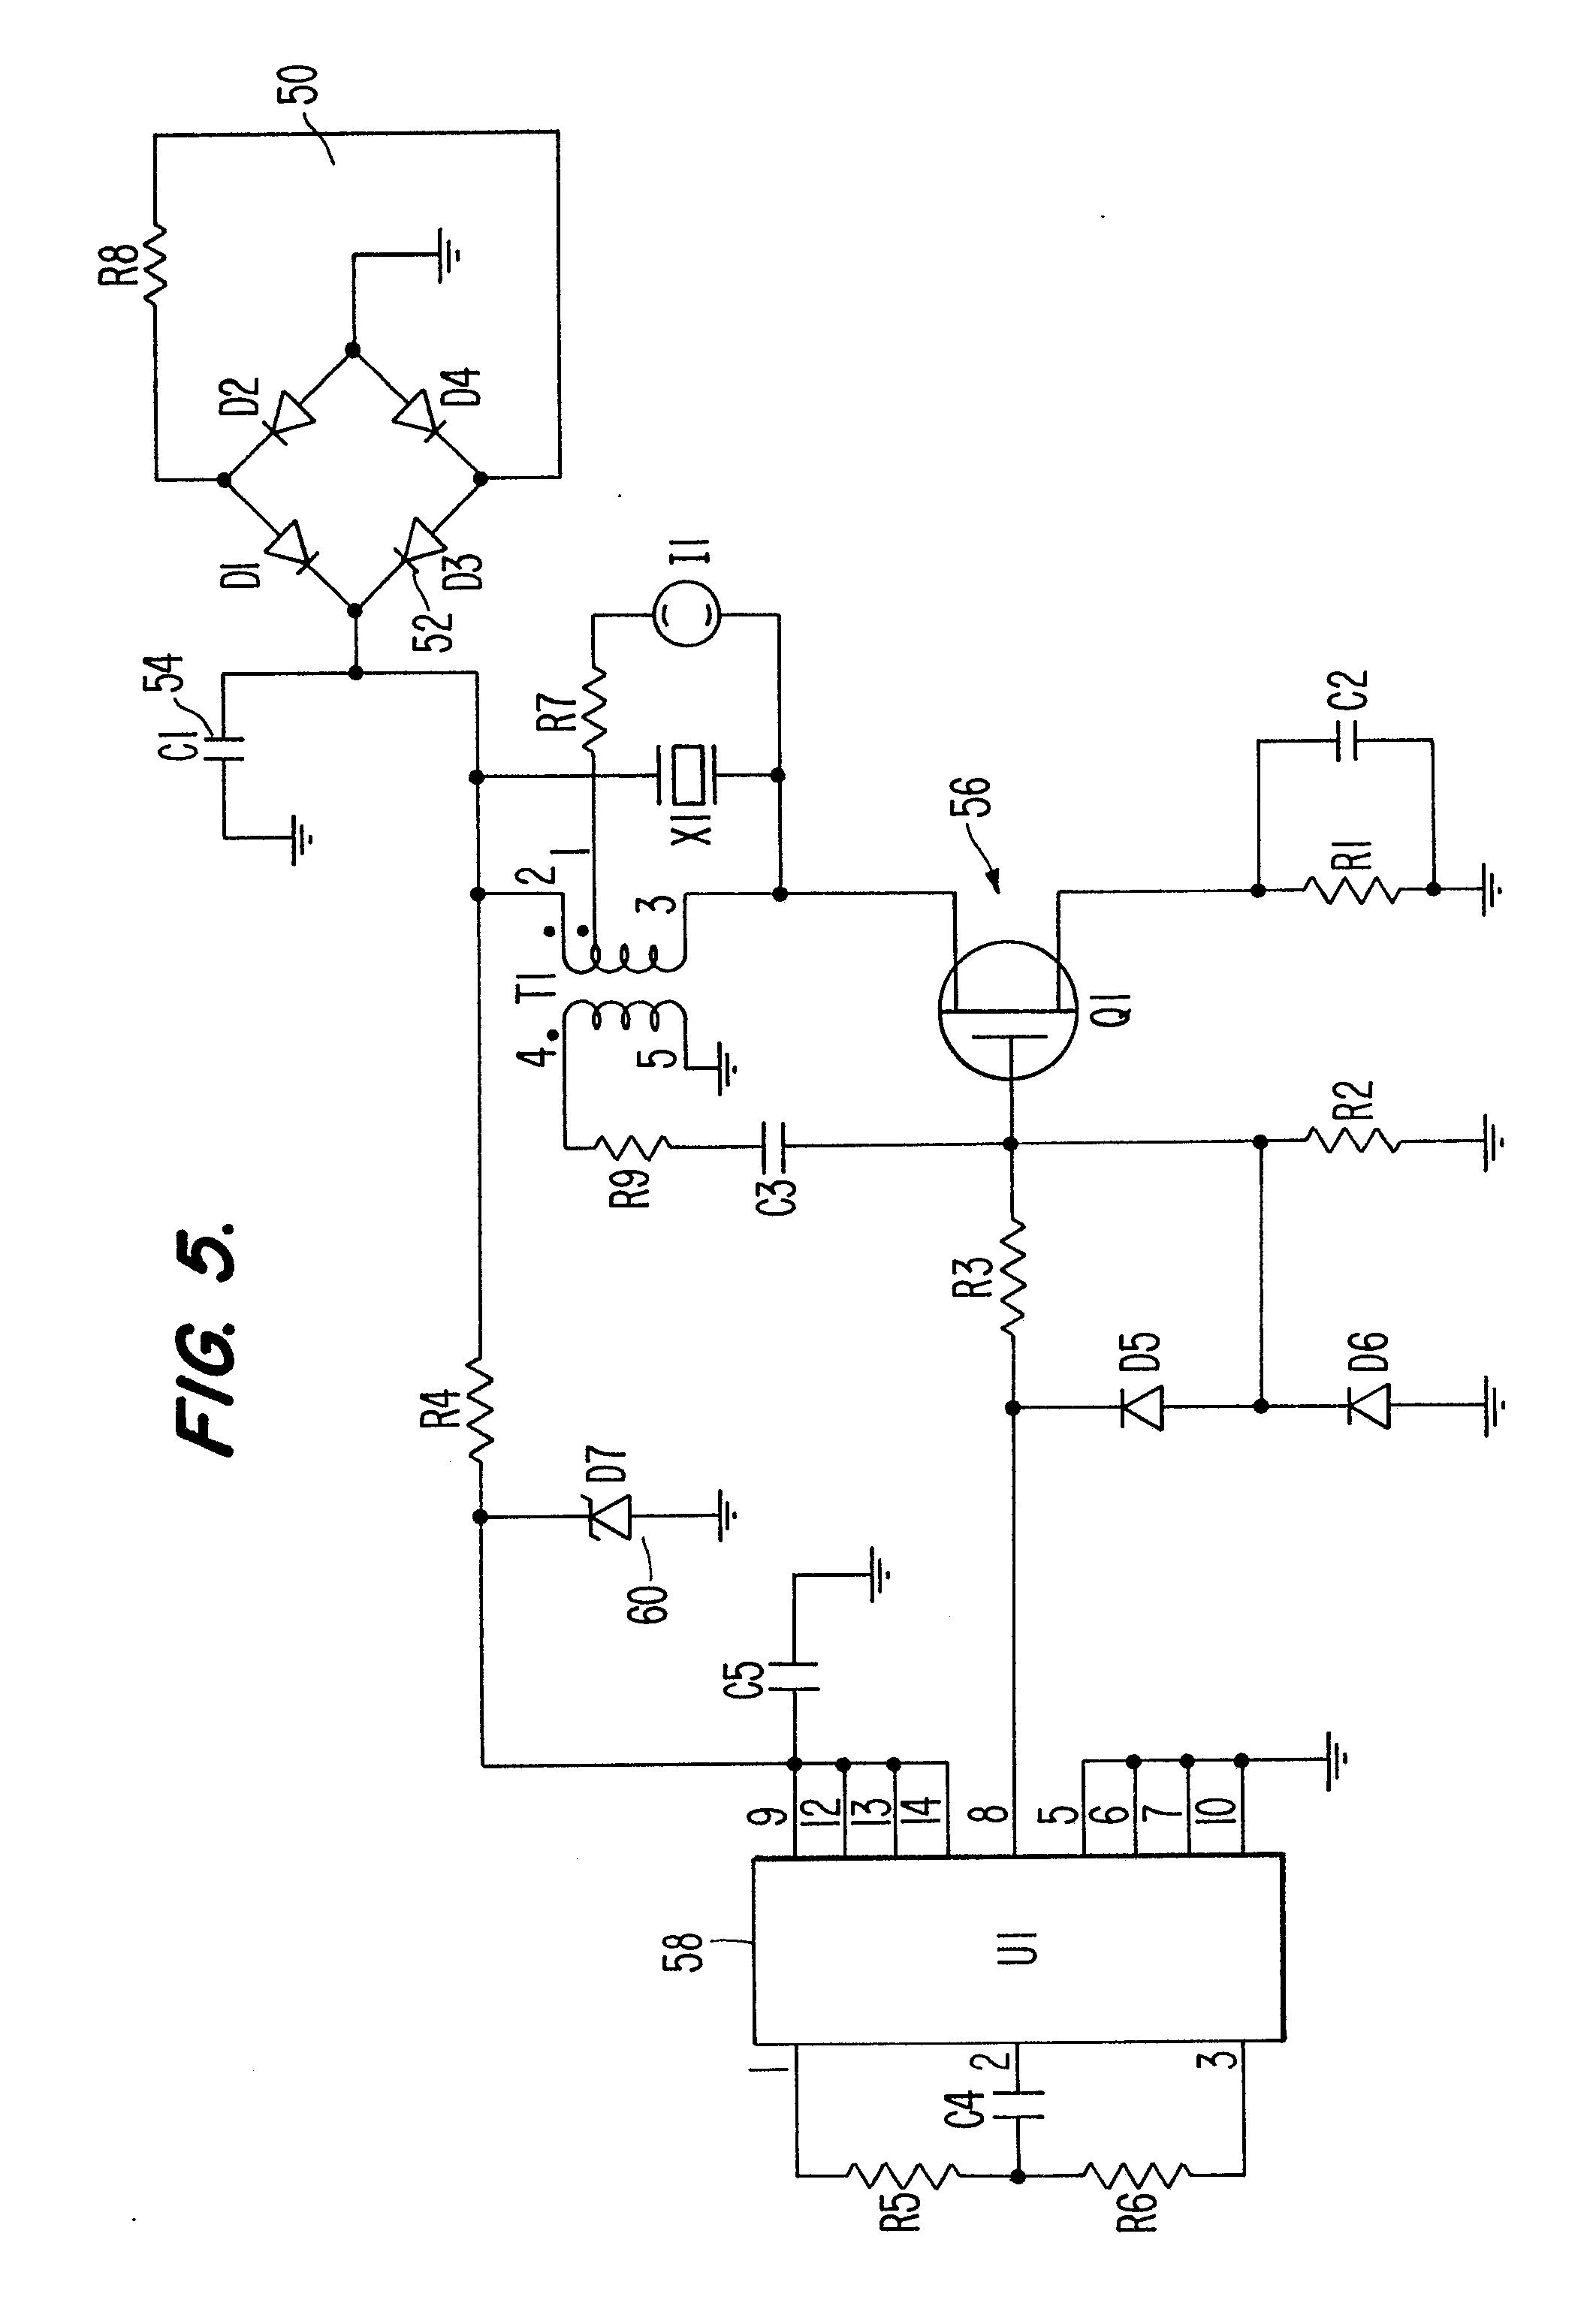 Ultrasonic lens cleaner - Patent 0354805 on ultrasonic cleaning transducer surface mount, ultrasonic rotary tool, ultrasonic doppler, ultrasonic polishers, ultrasonic detector, ultrasonic embossing,